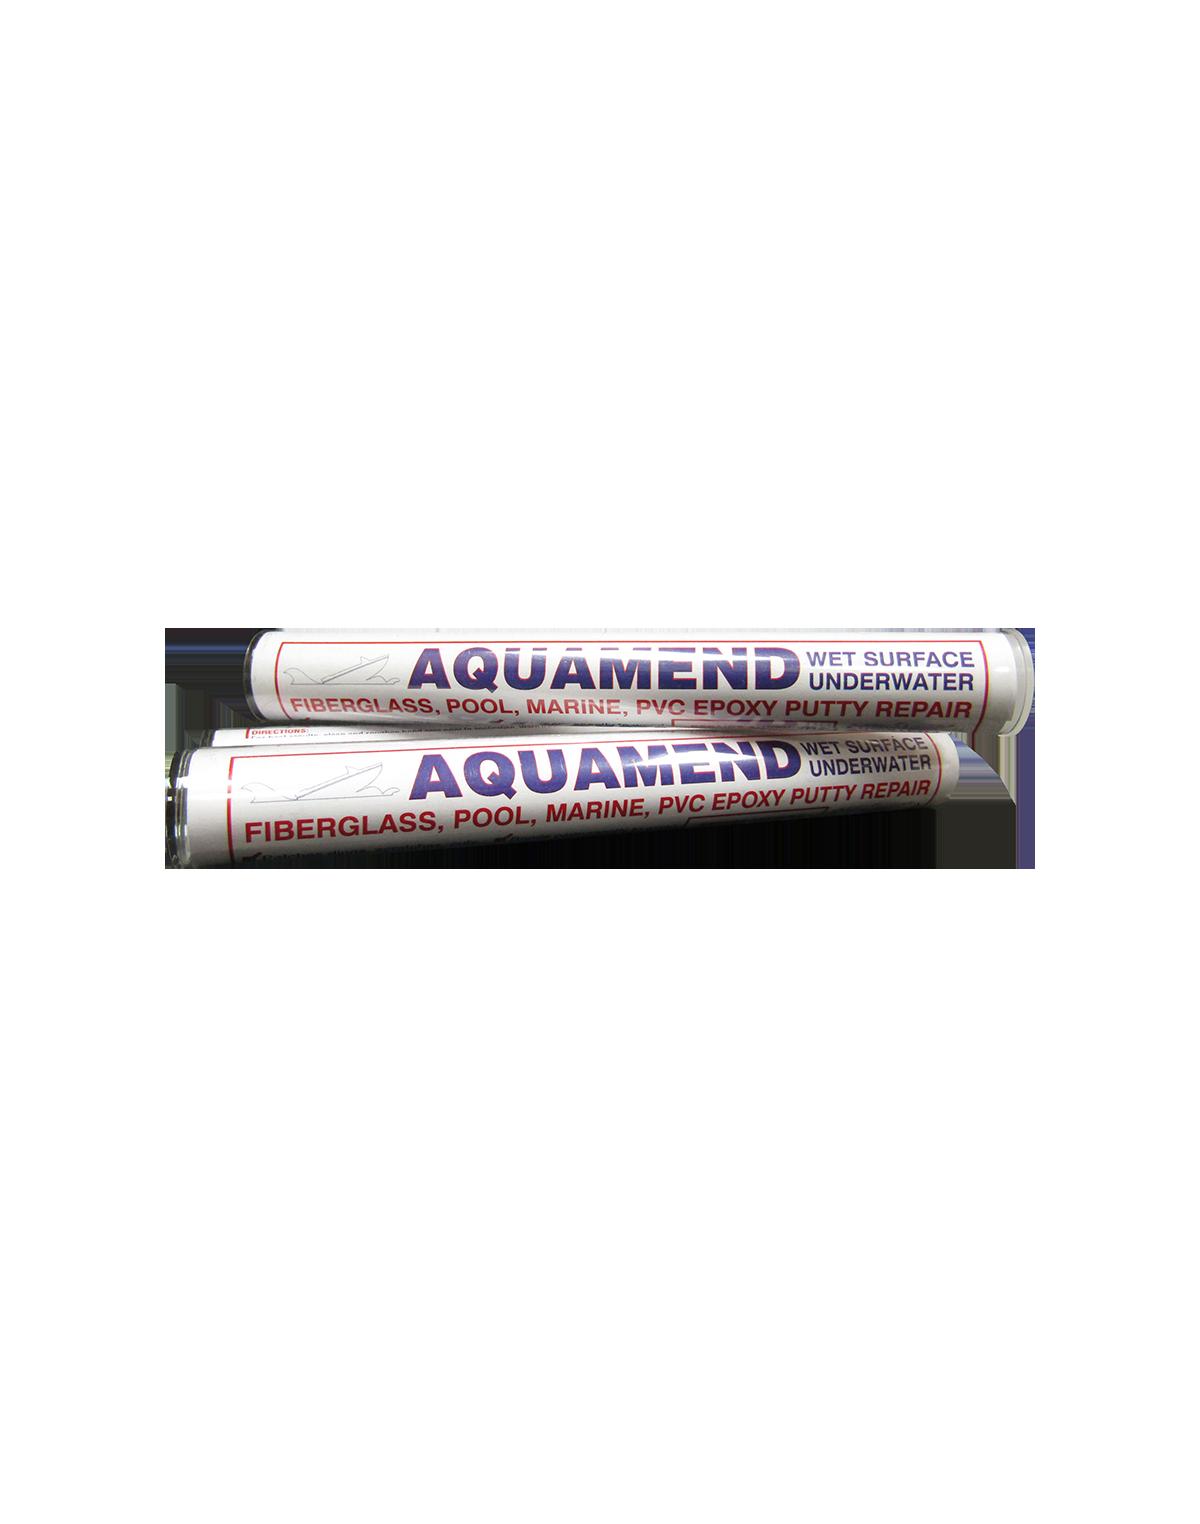 Aquamend Bucket - Nationwide Protective Coatings